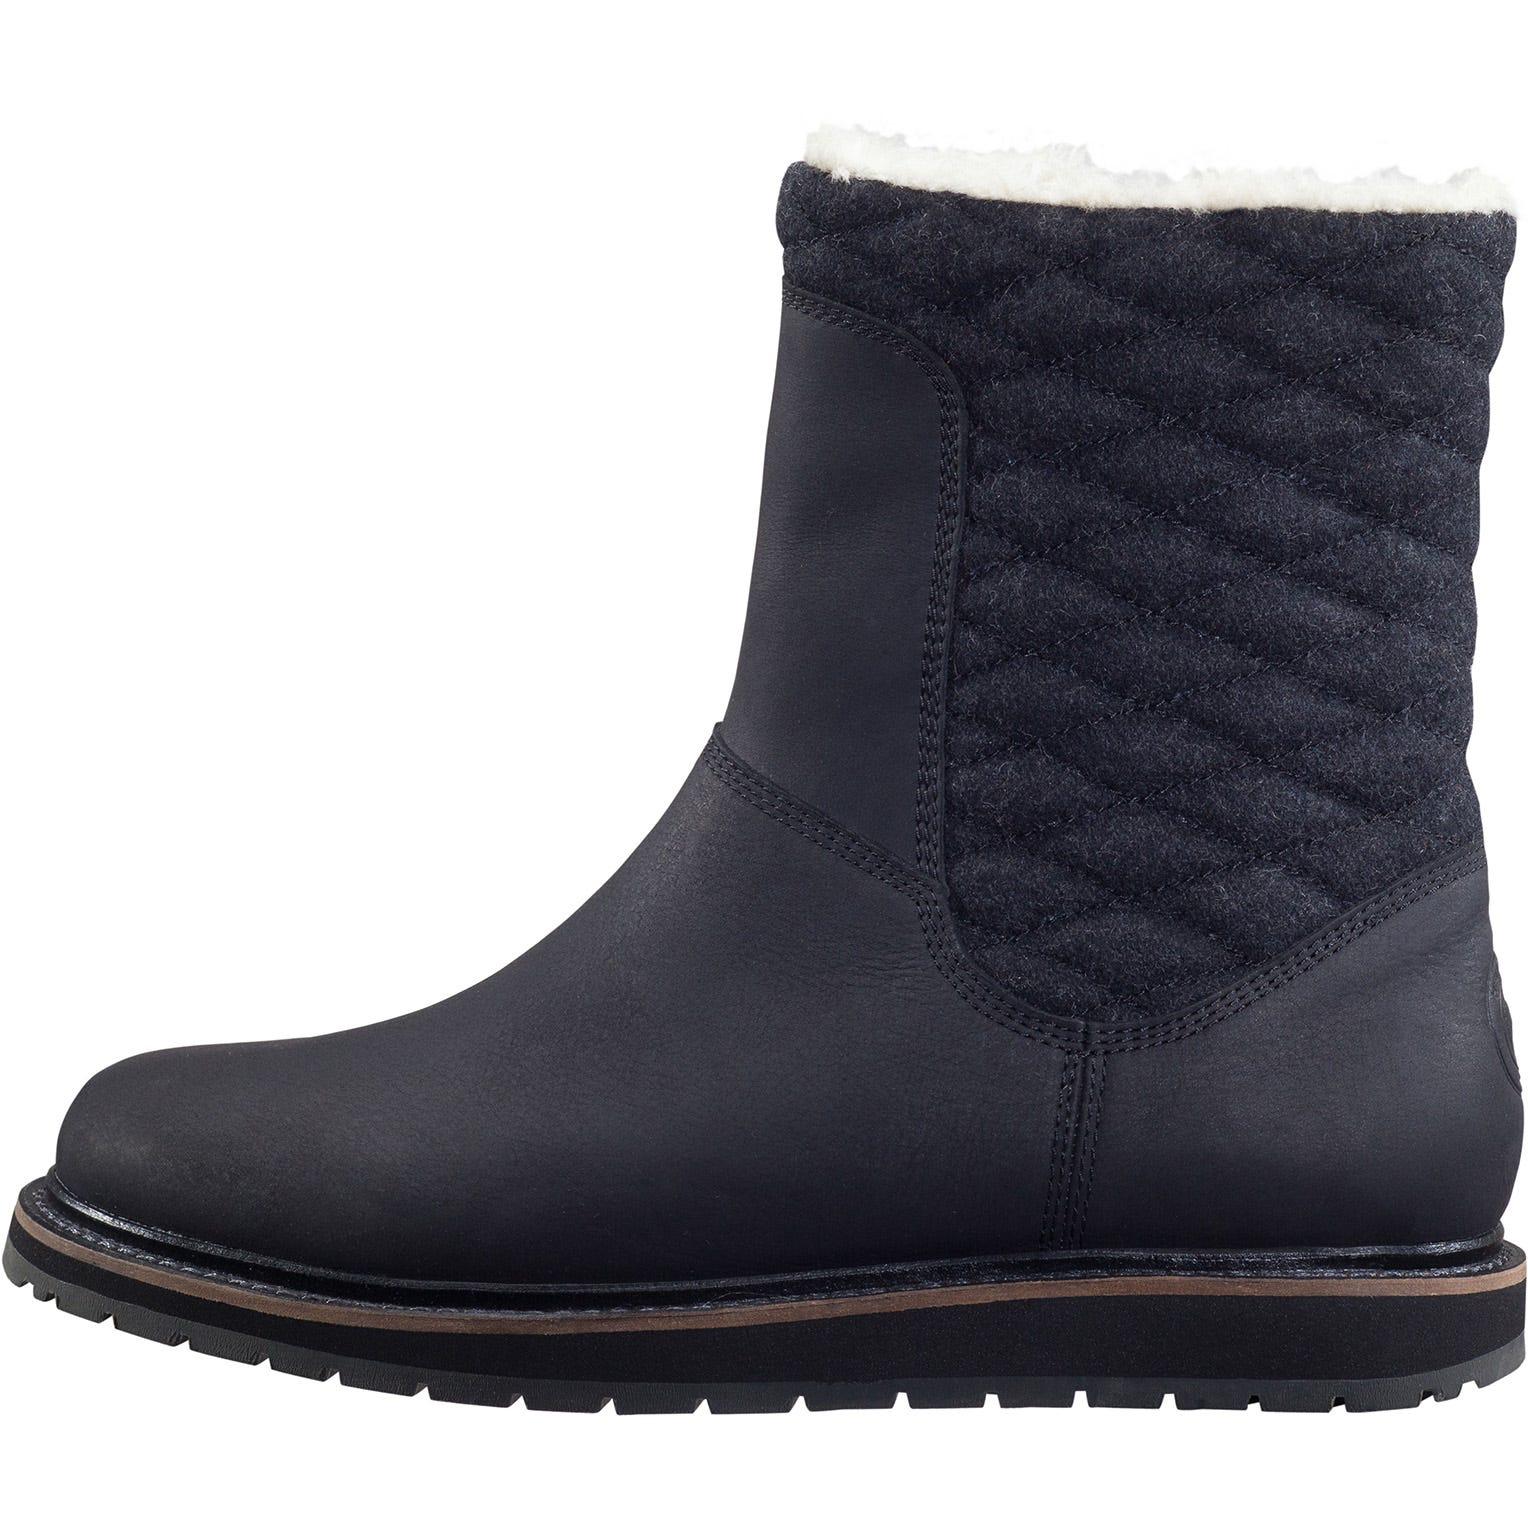 Helly Hansen W Seraphina Womens Winter Boot Black 40/8.5